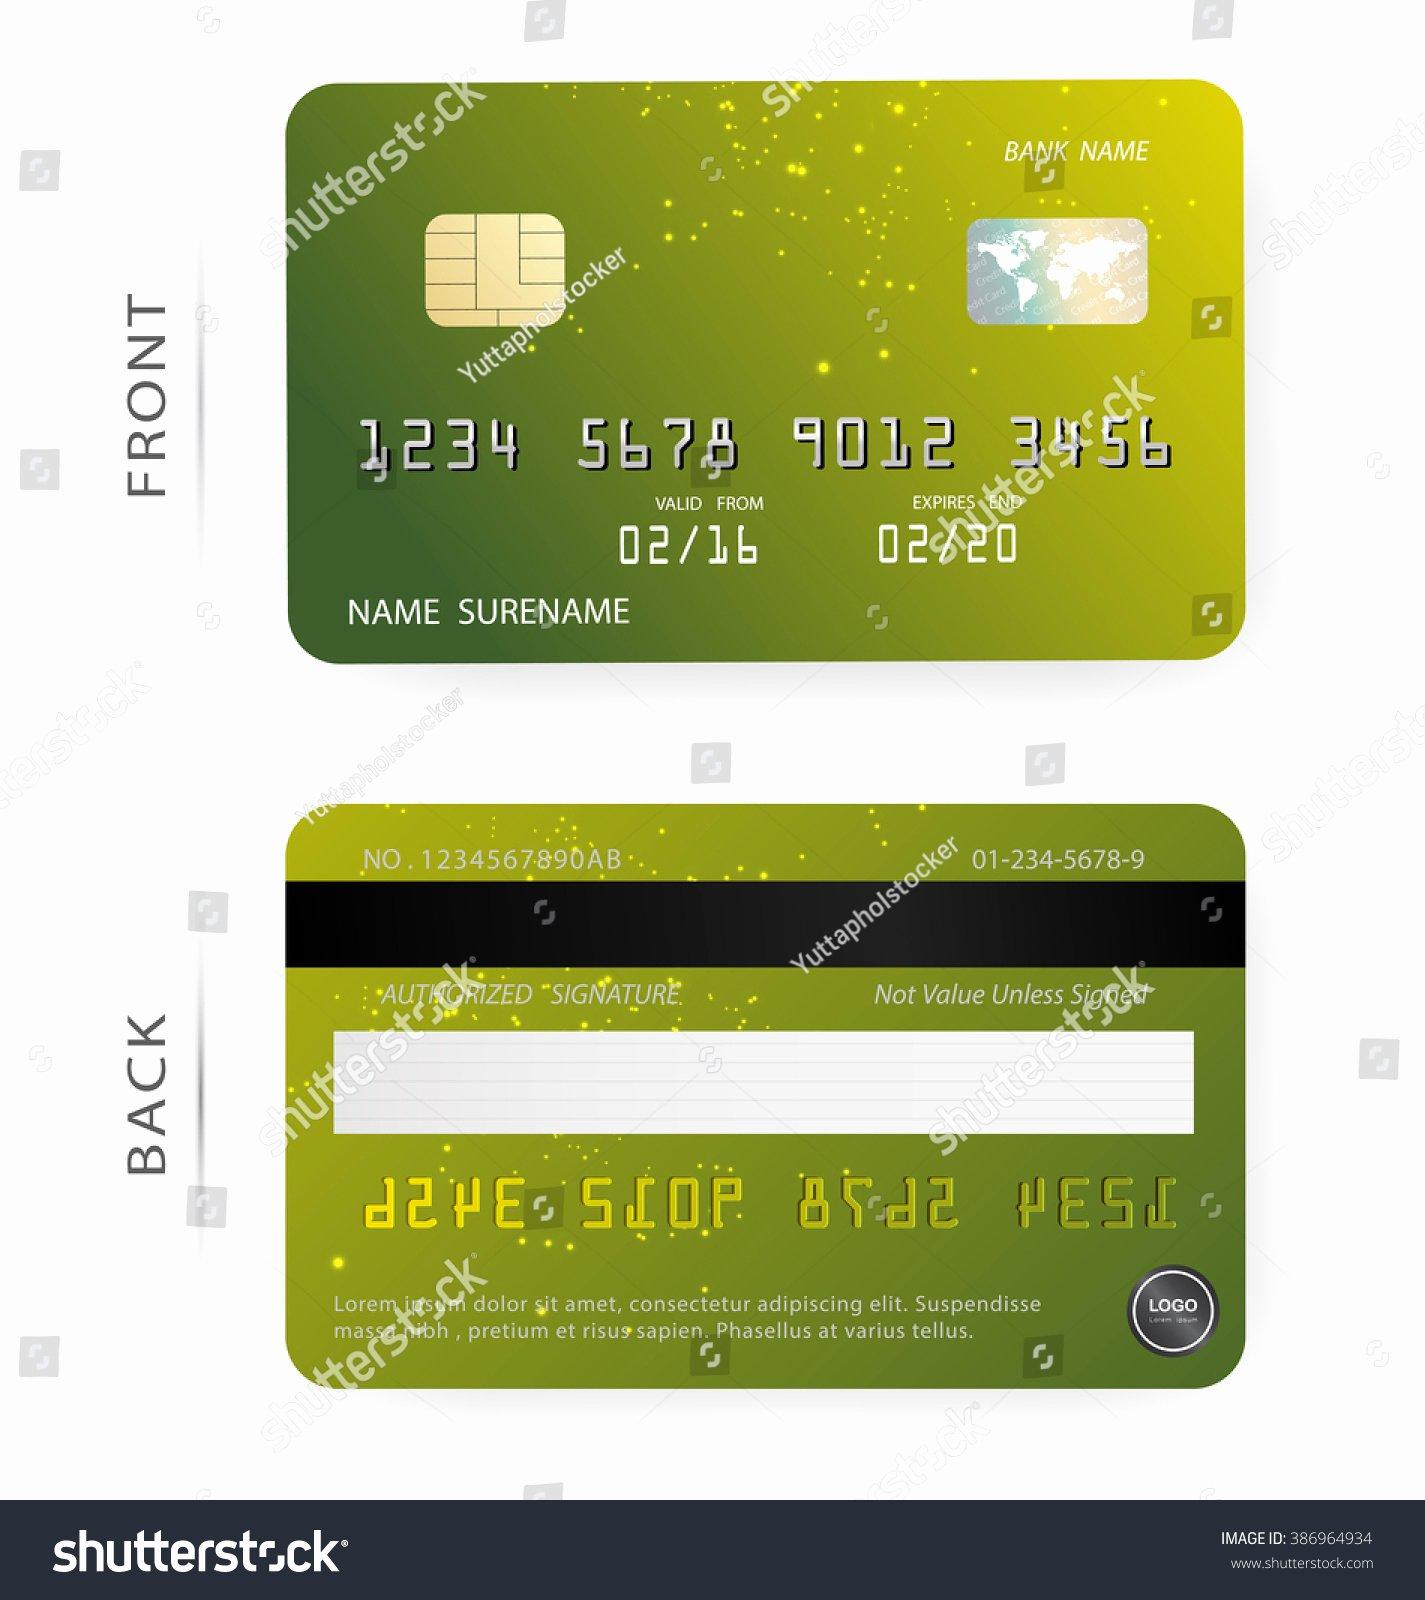 Credit Card Design Template Elegant Vectorgreen orange Abstract Bright Stars Patterns Stock